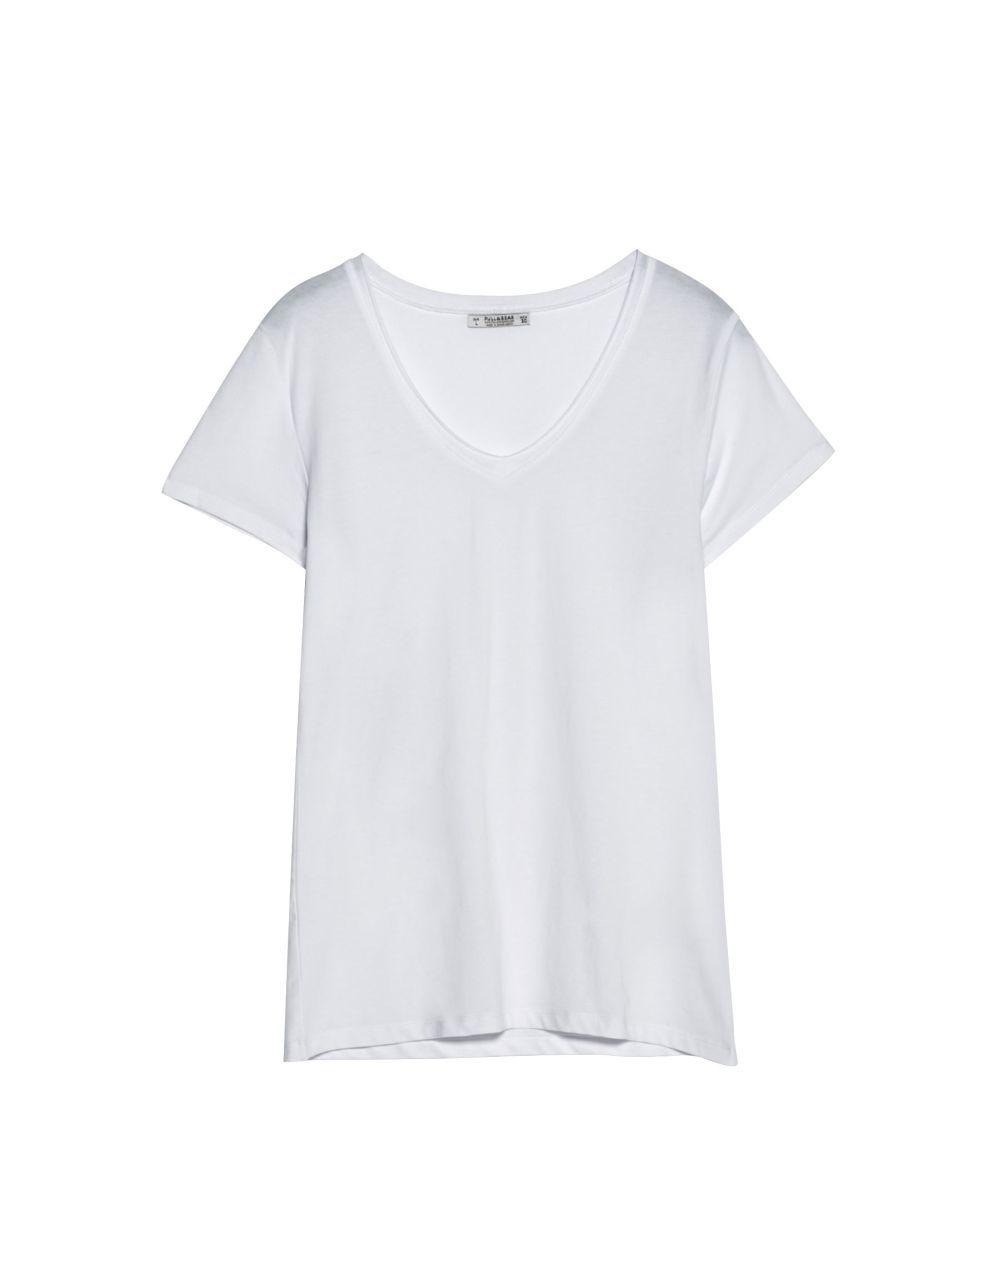 Camiseta básica Pull&Bear (4,99 euros)